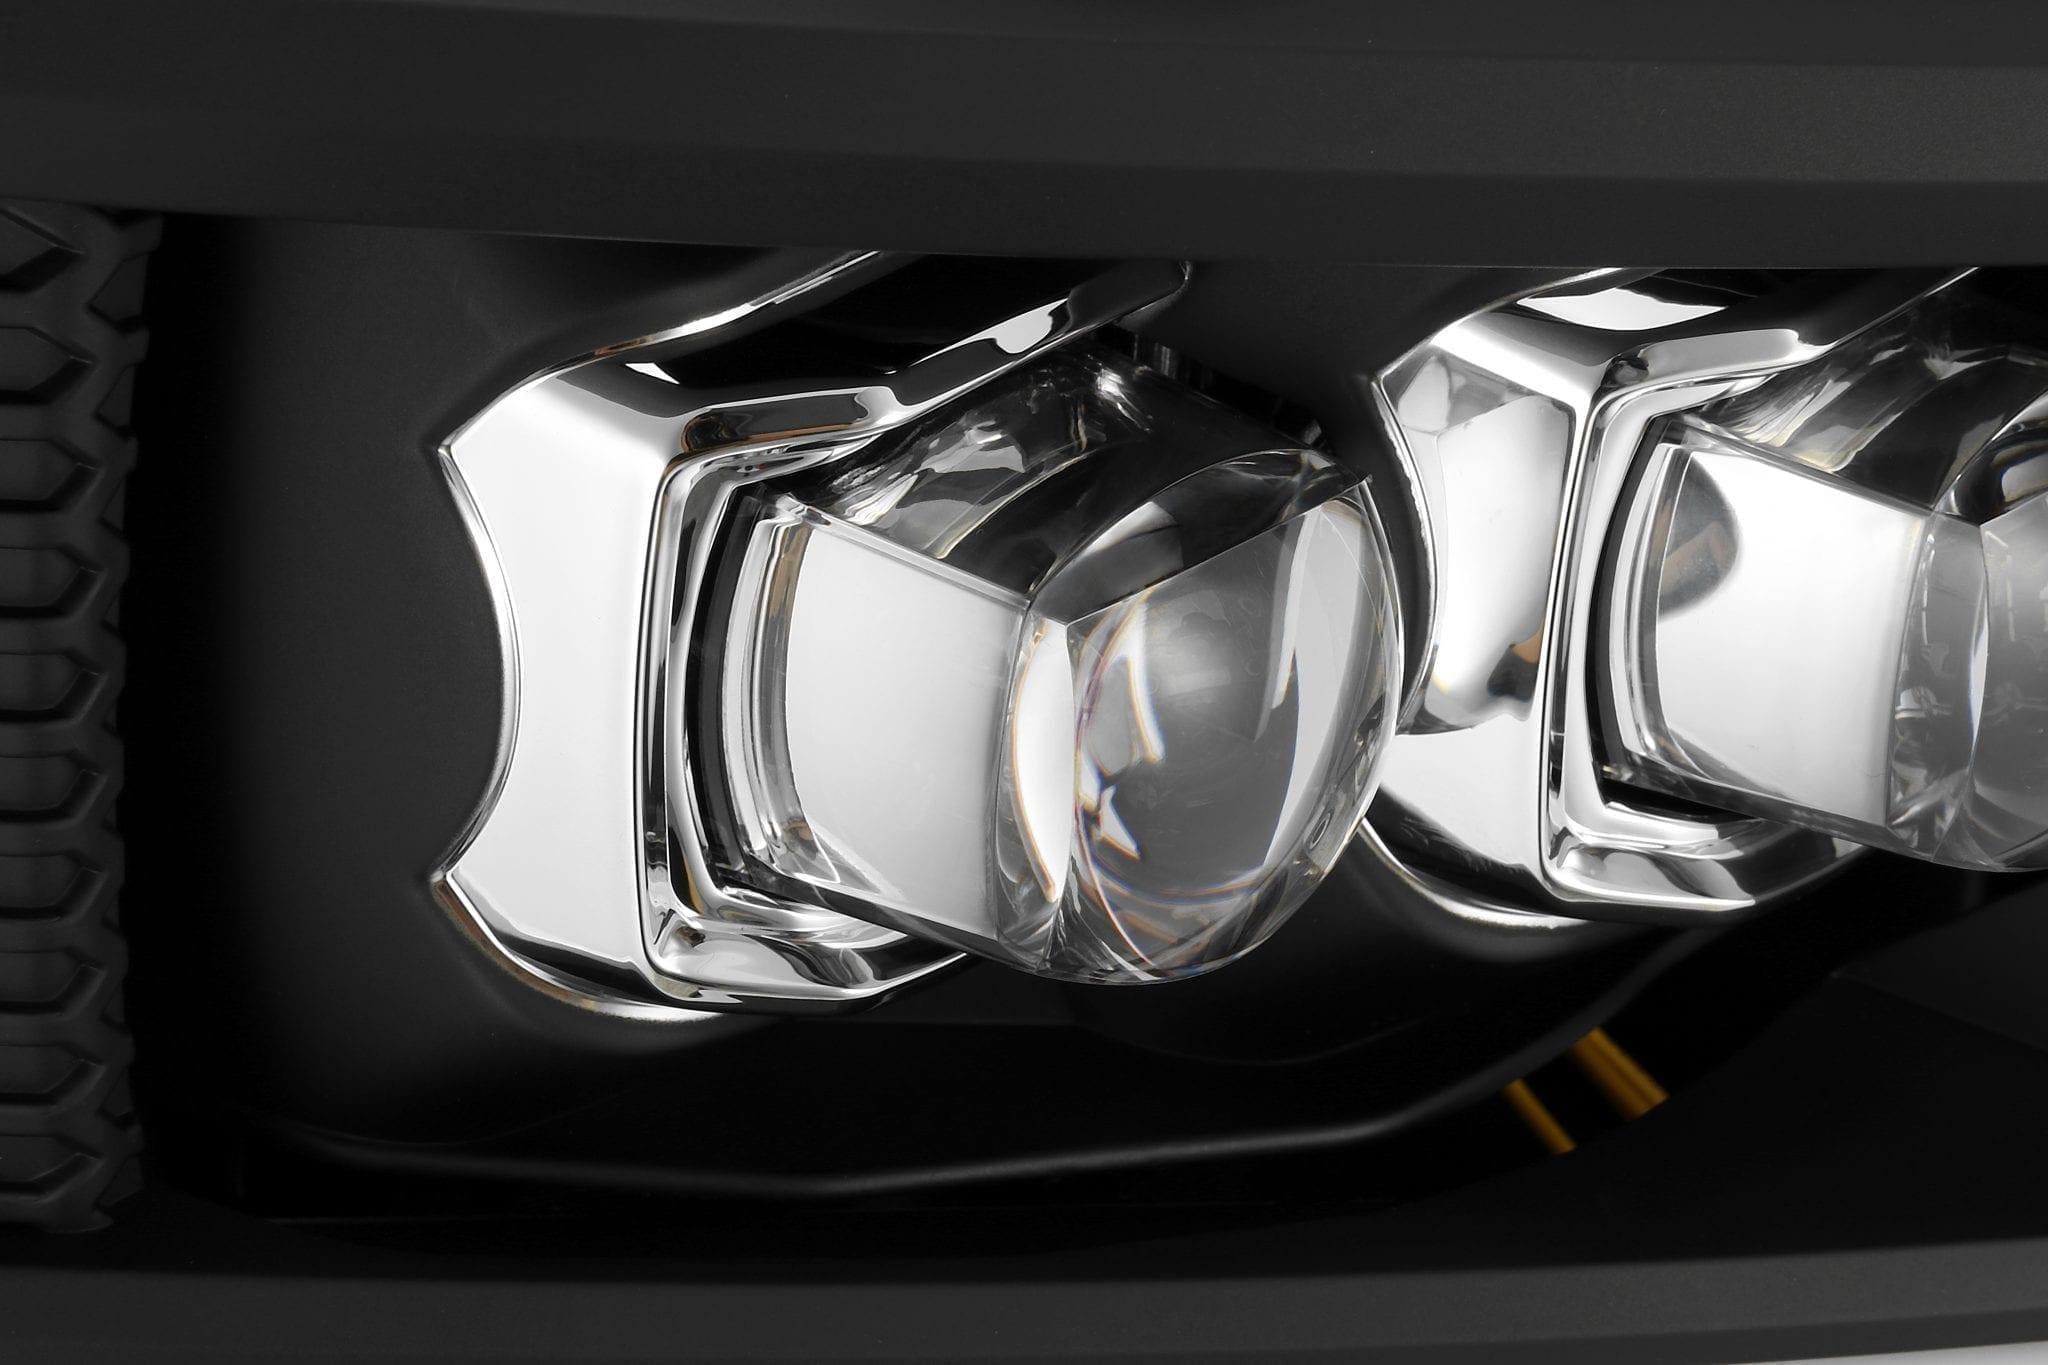 AlphaRex 2007 2008 2009 2010 2011 2012 2013 Chevrolet Silverado NOVA-Series Full LED Projector Headlights Black